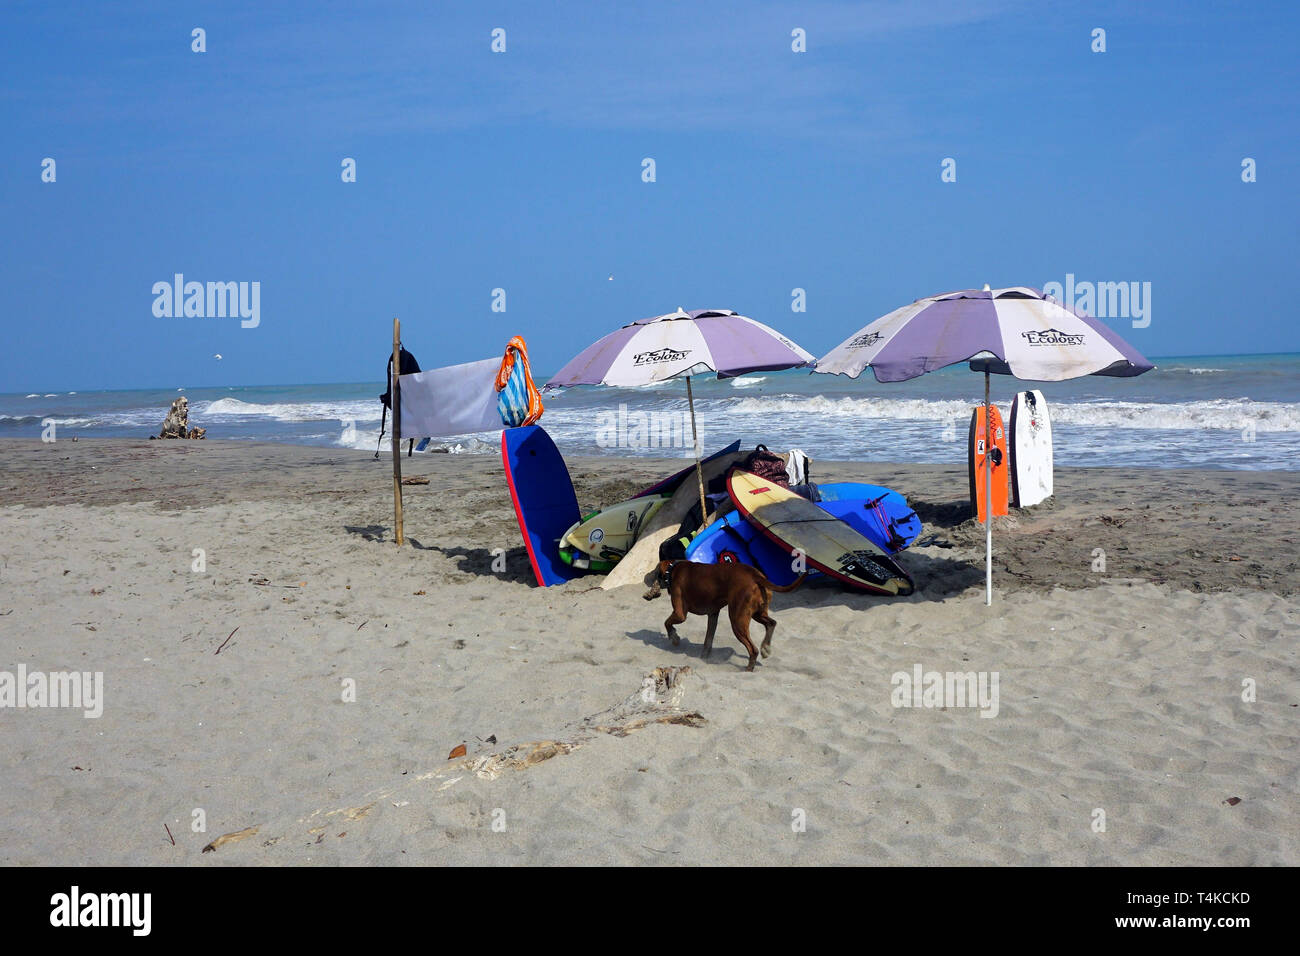 Sunny Beach Scene with Sun Umbrellas, Surfboards and Bodyboards - Stock Image